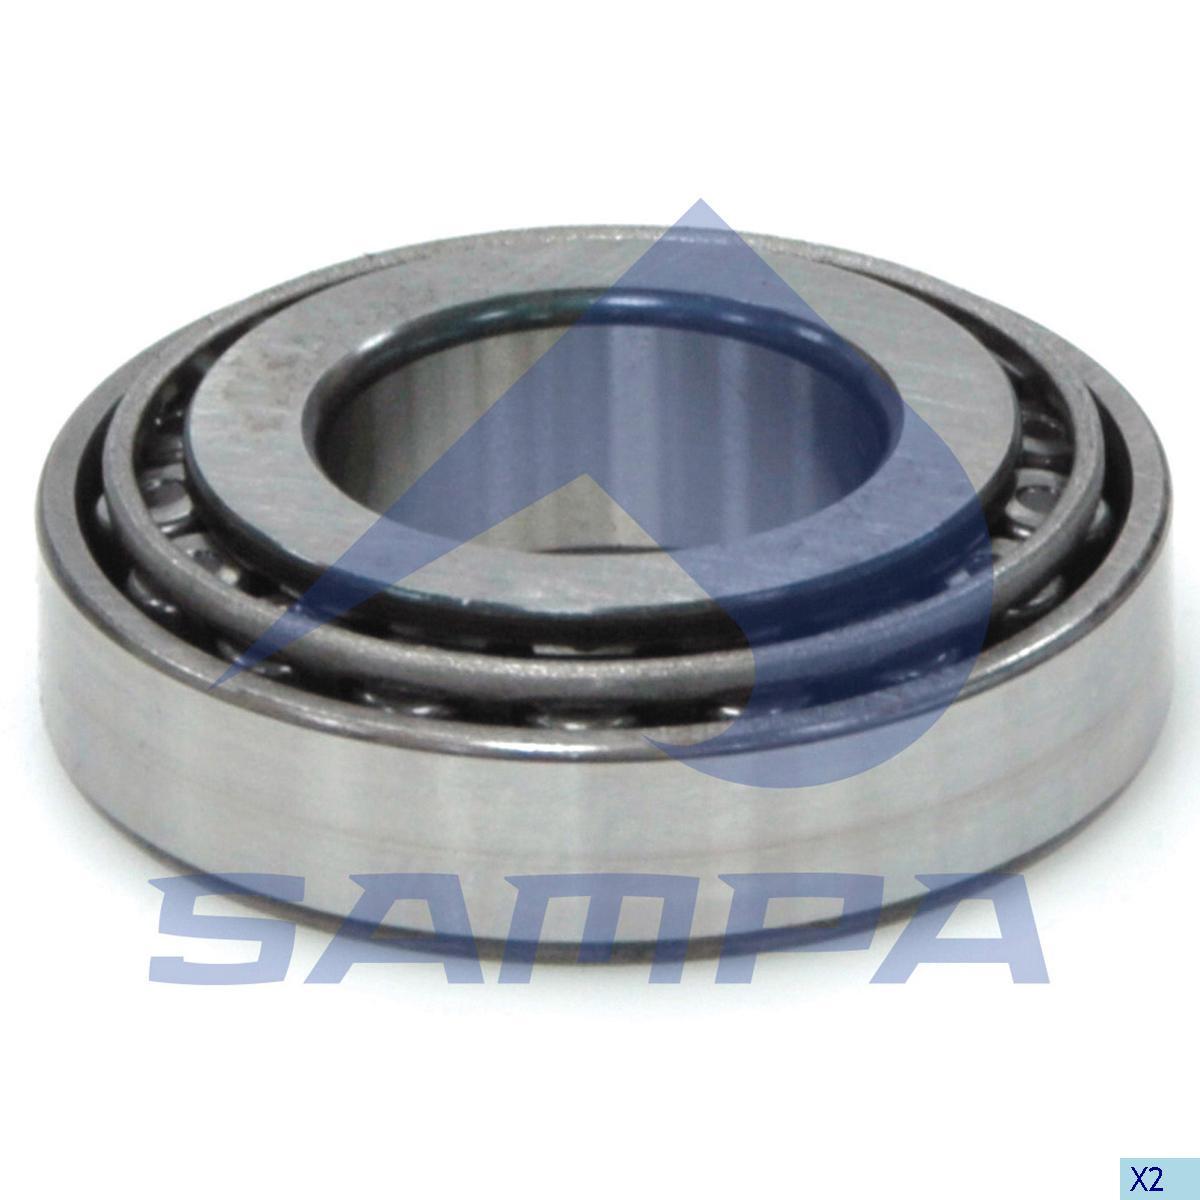 Bearing, Main Shaft, Iveco, Gear Box